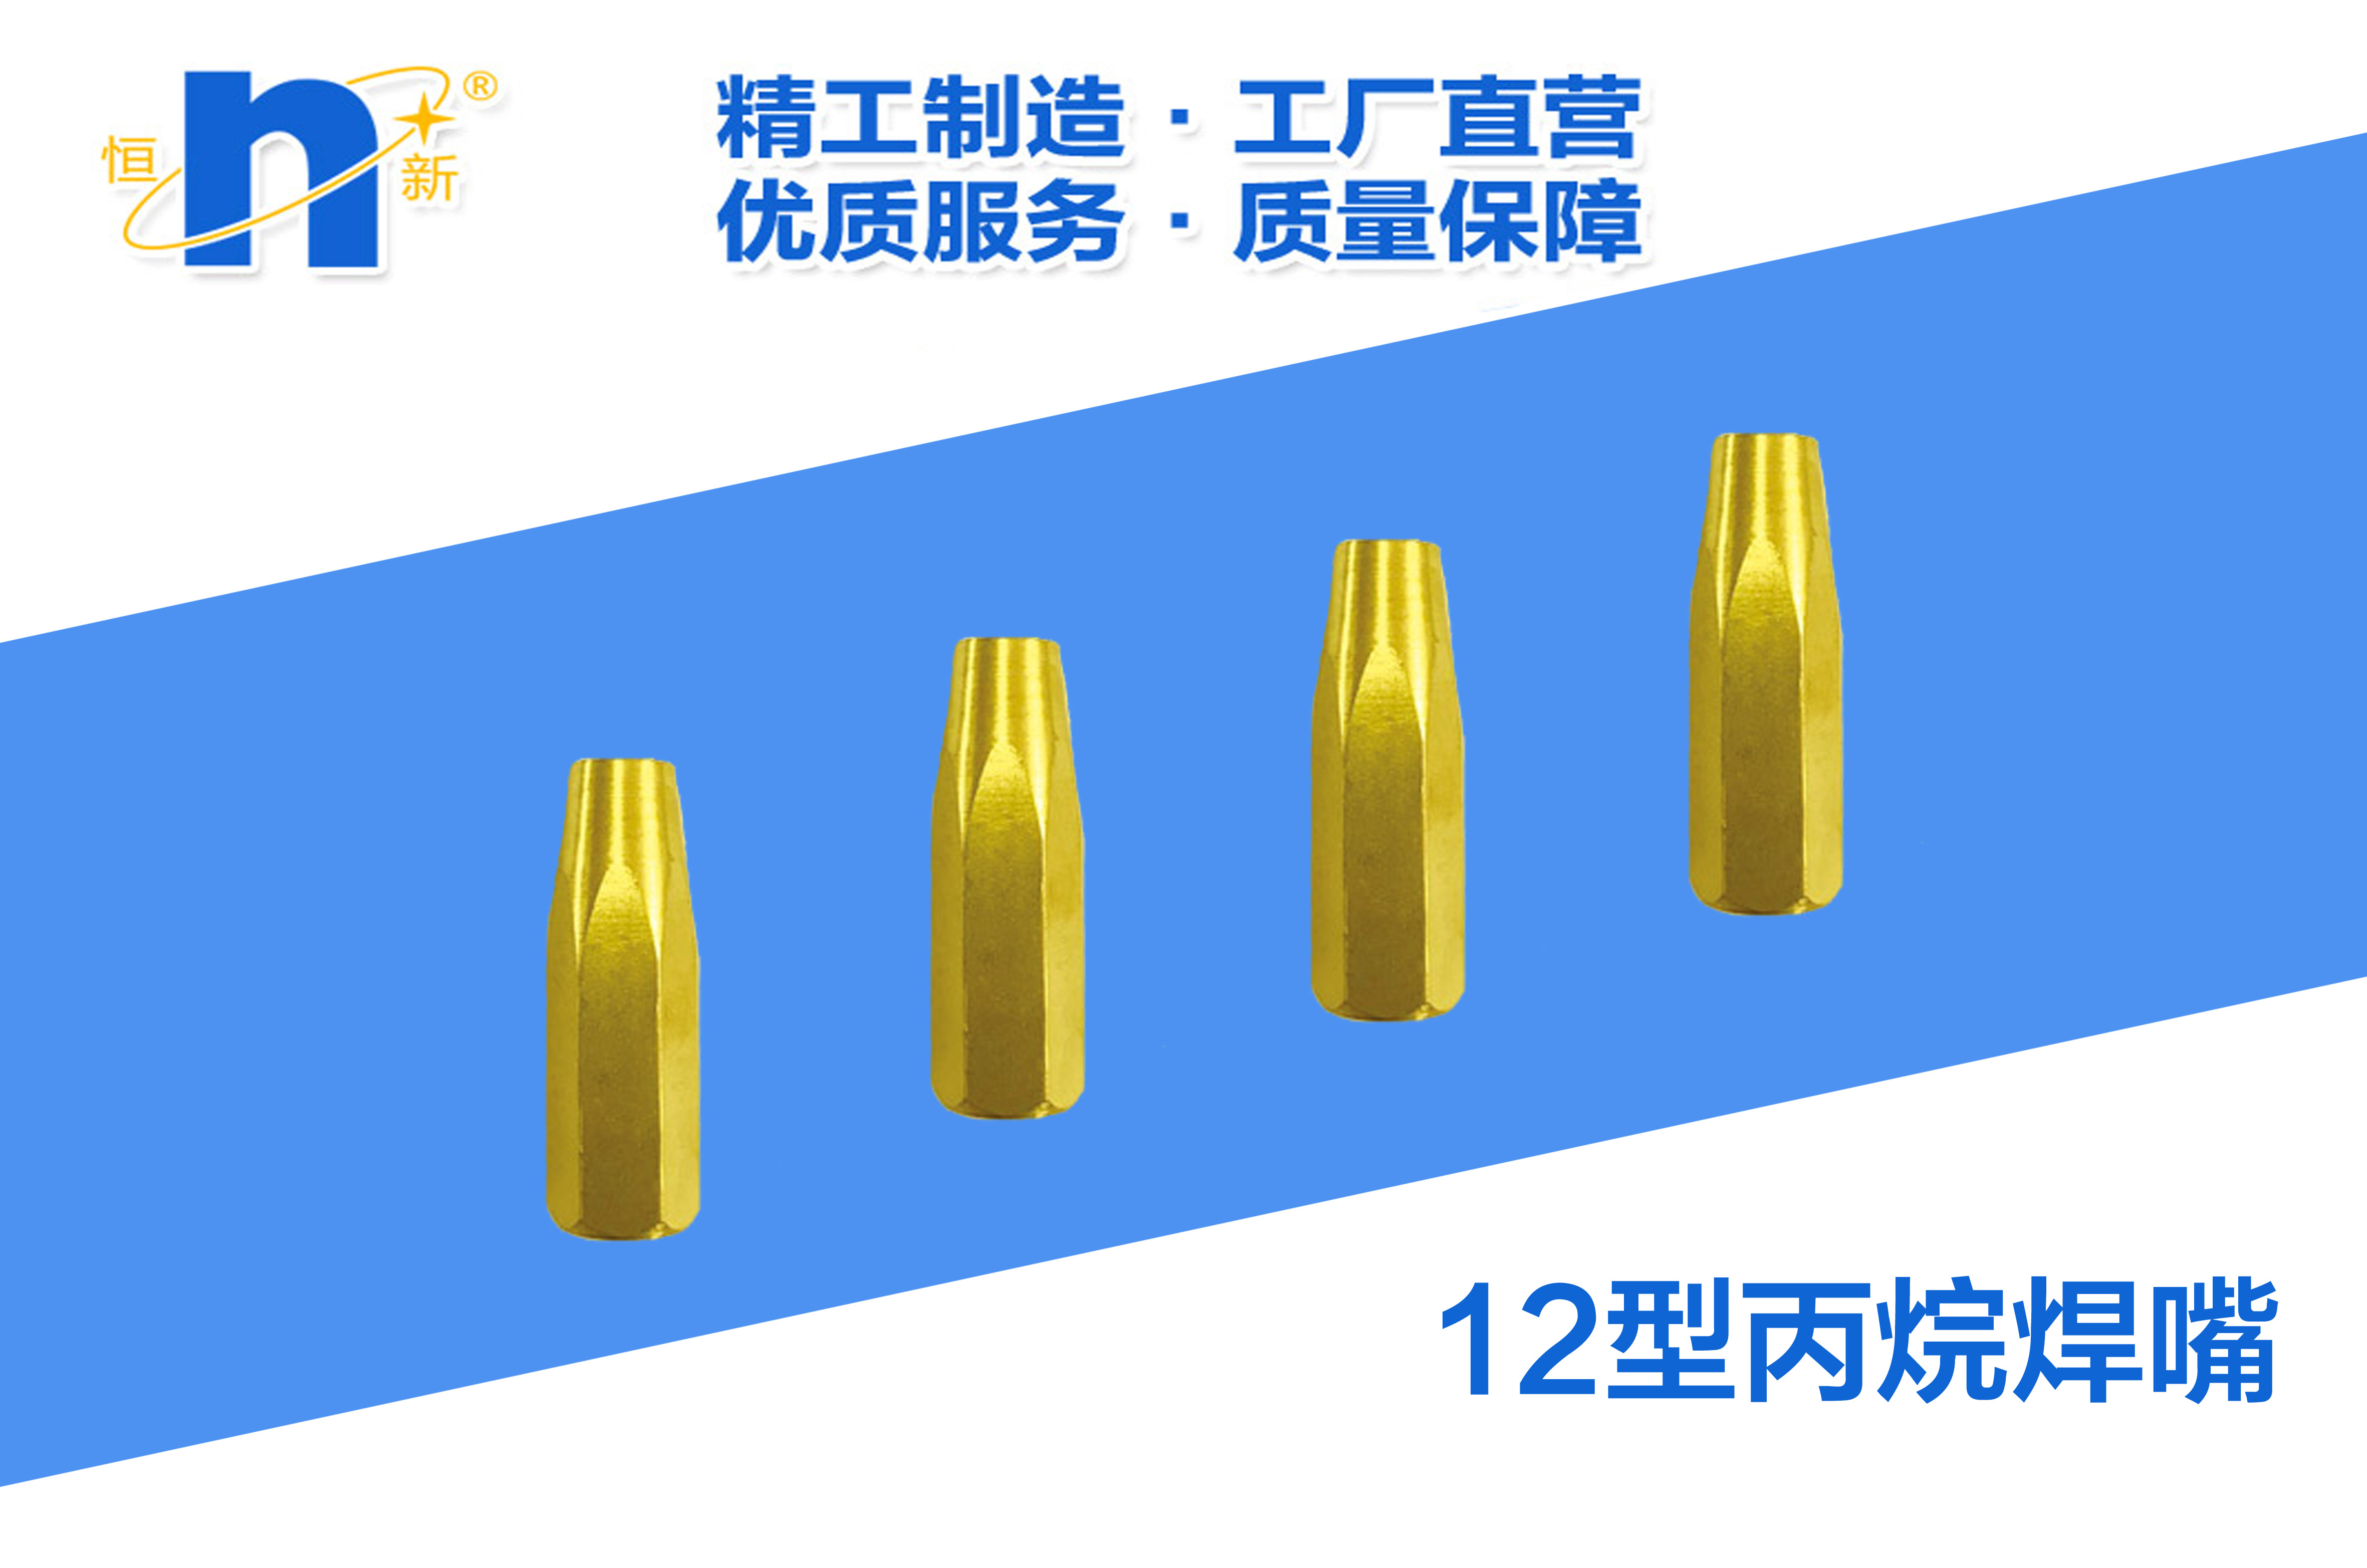 H07-12丙烷焊嘴  恒新